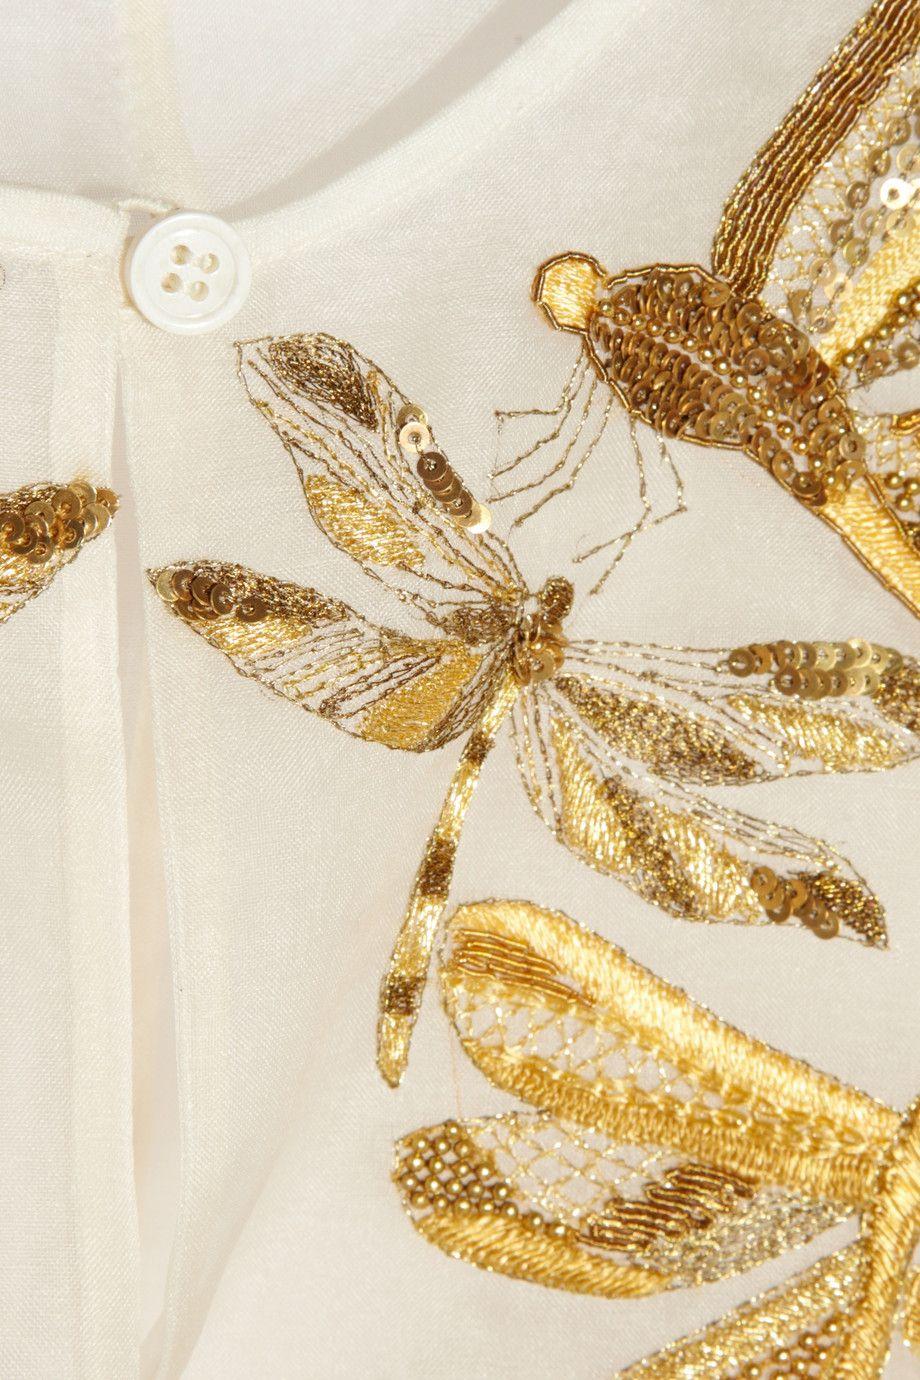 Alexander Mcqueen  Embroidered Silkorganza Blouse Aporter